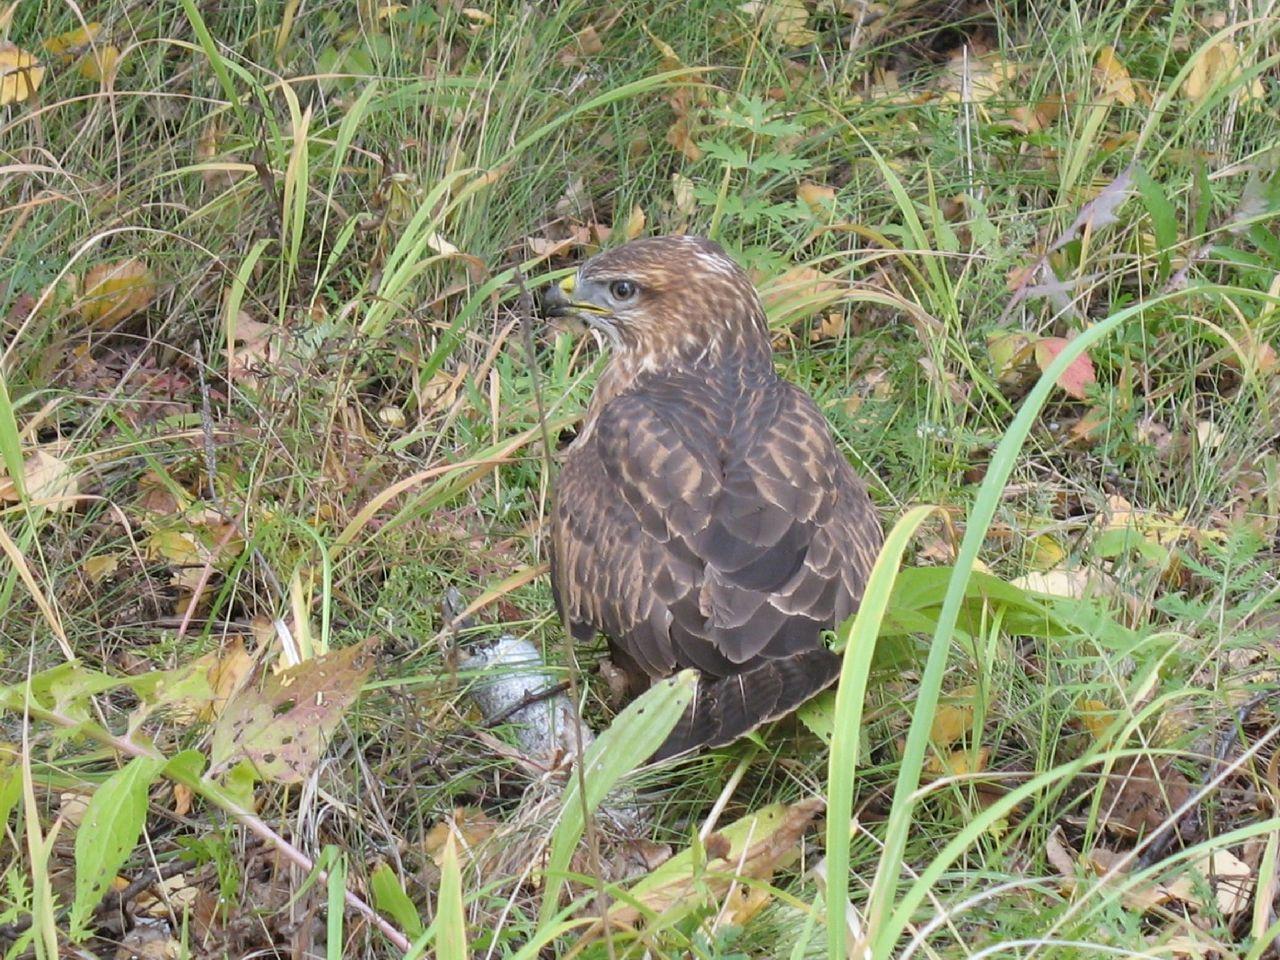 птицелов животное фото найти эти